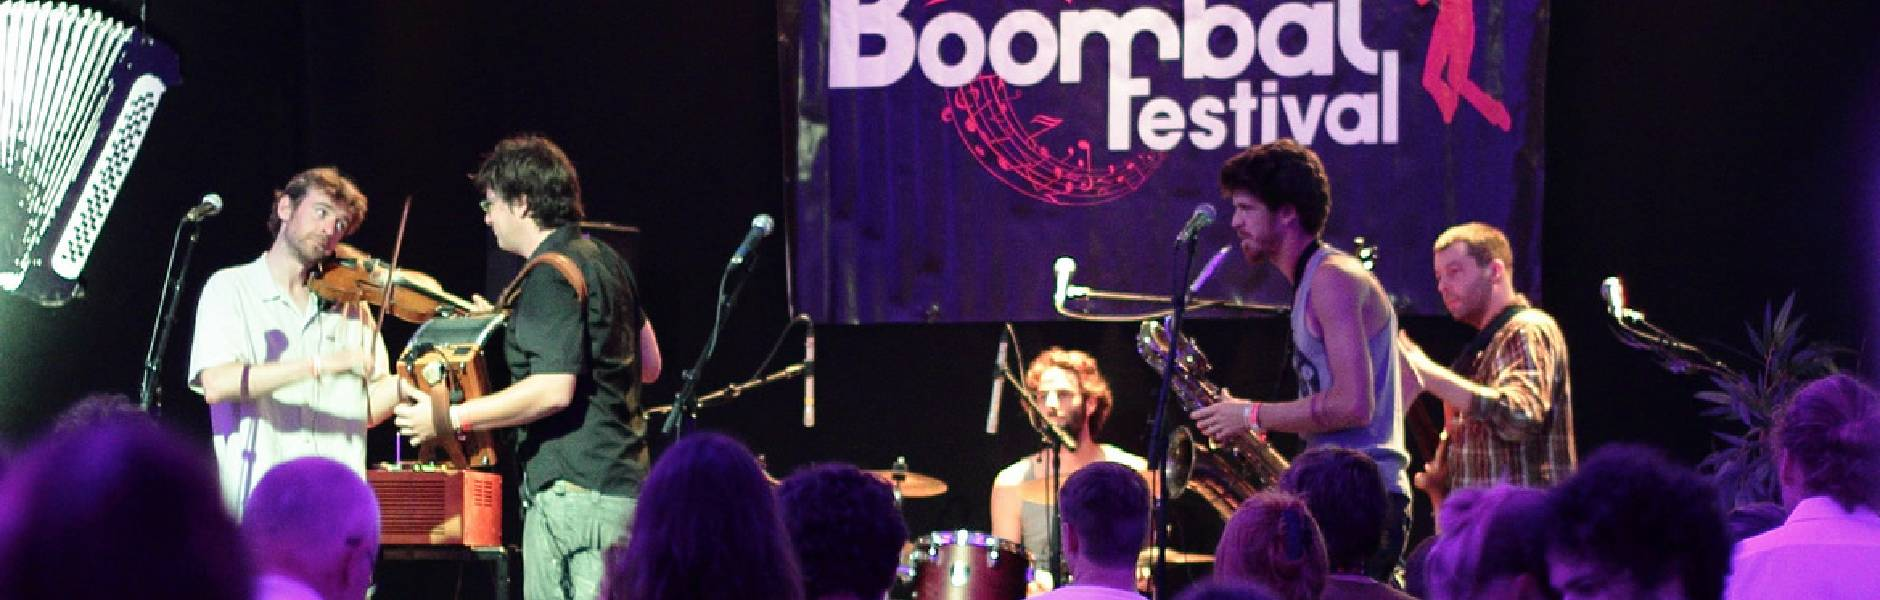 Boombalfestival